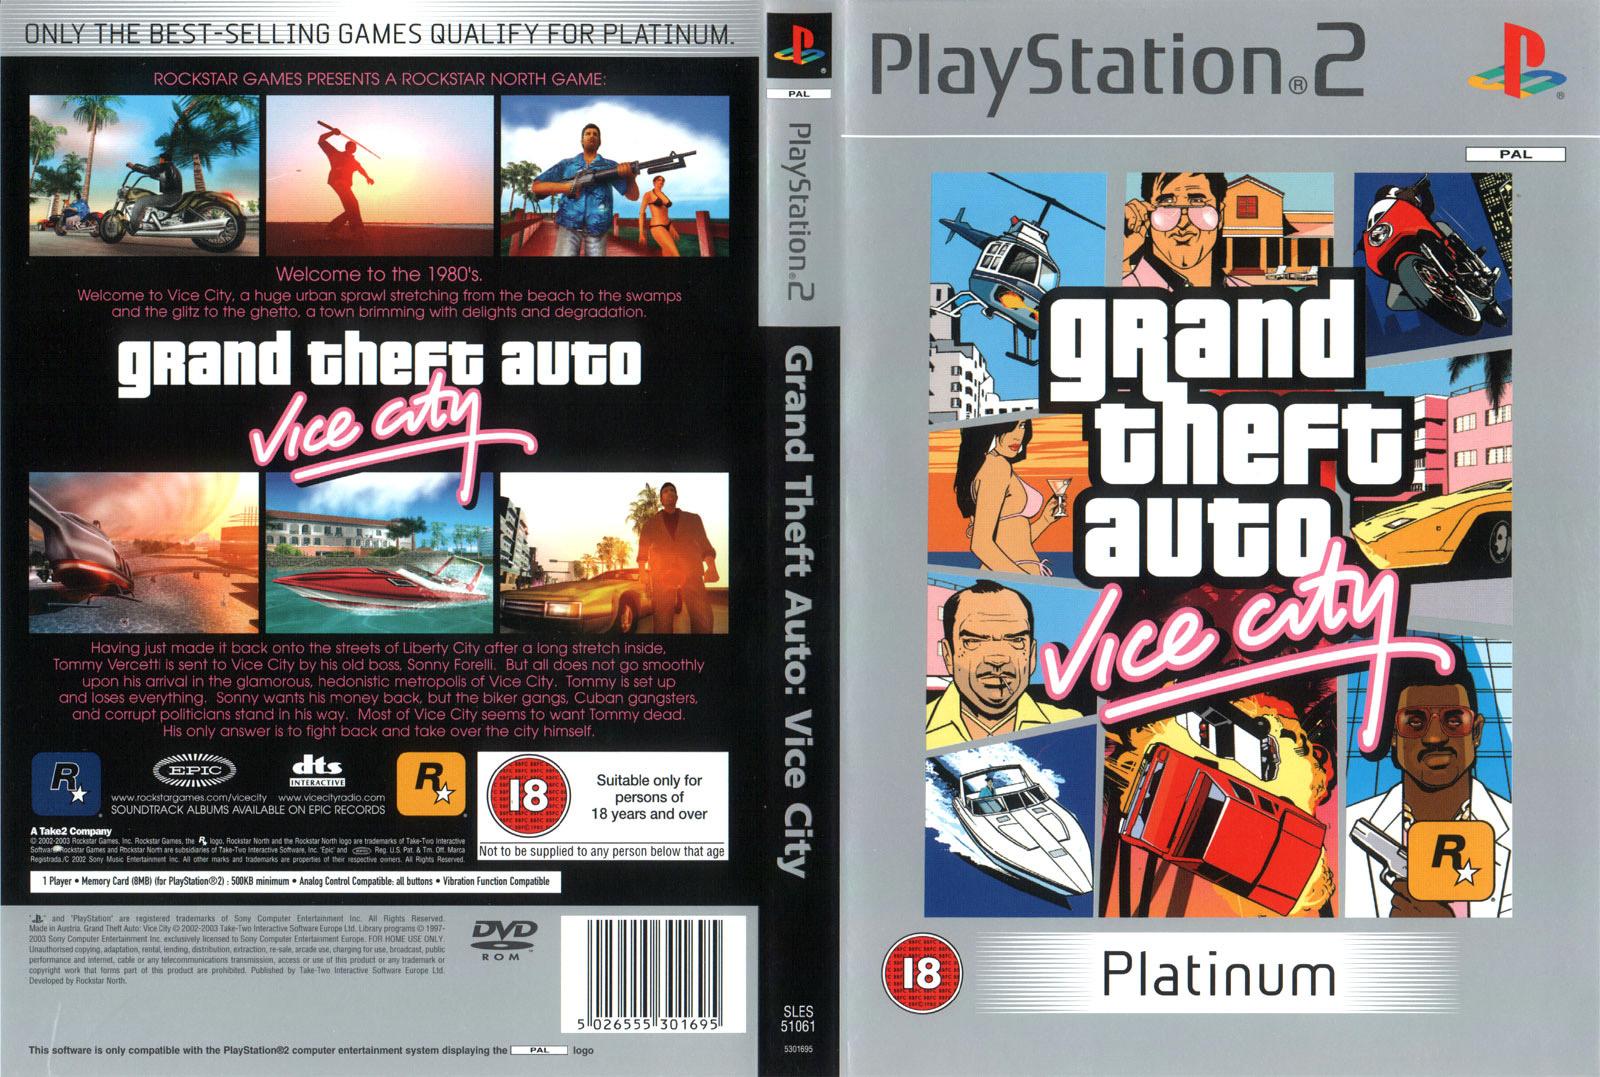 Grand Theft Auto# Vice City.Iso